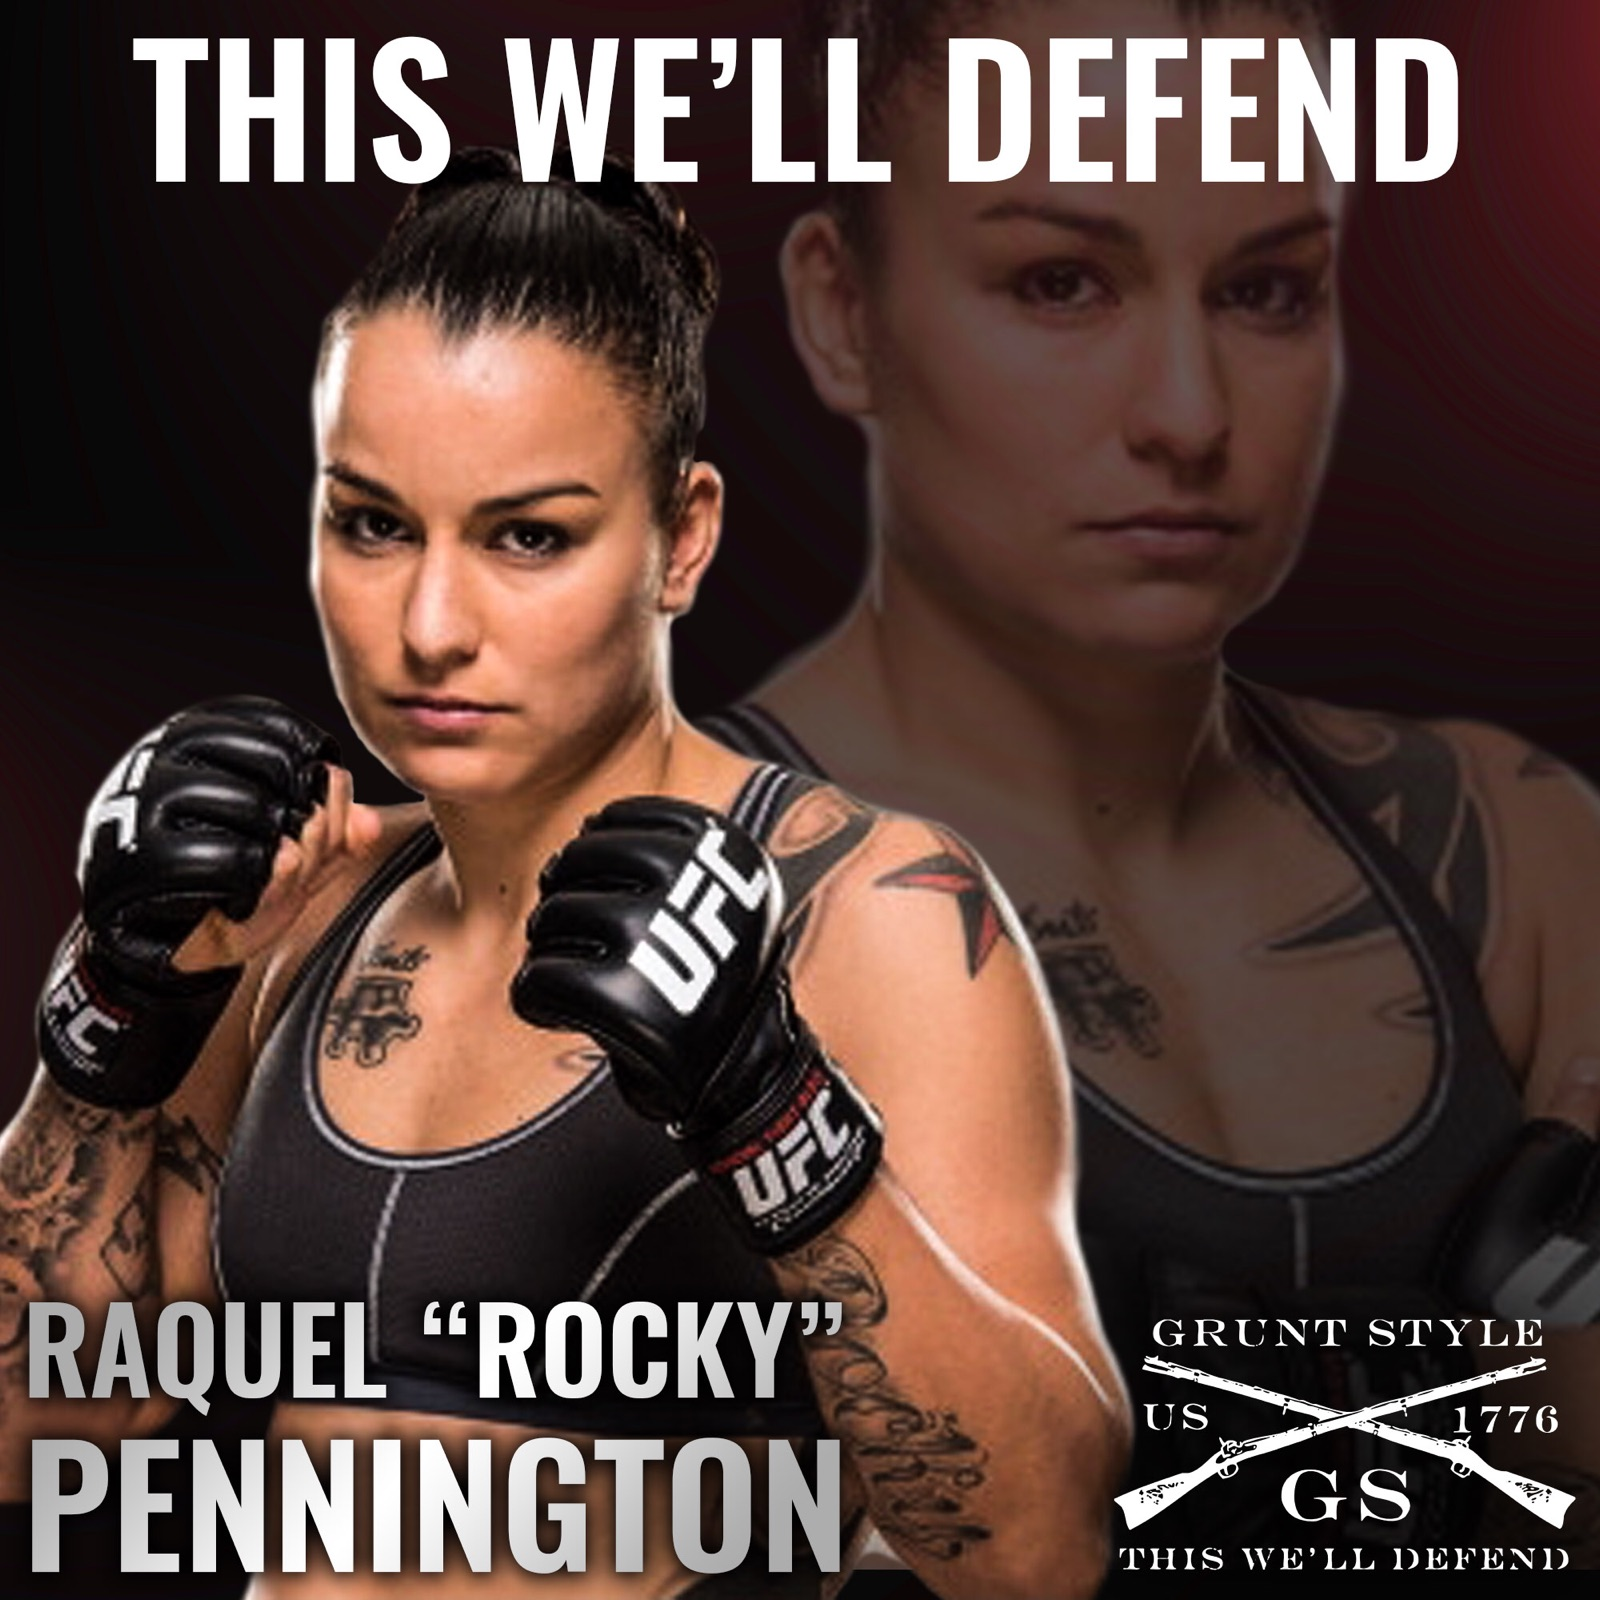 Raquel Pennington DB Group Grunt Style P